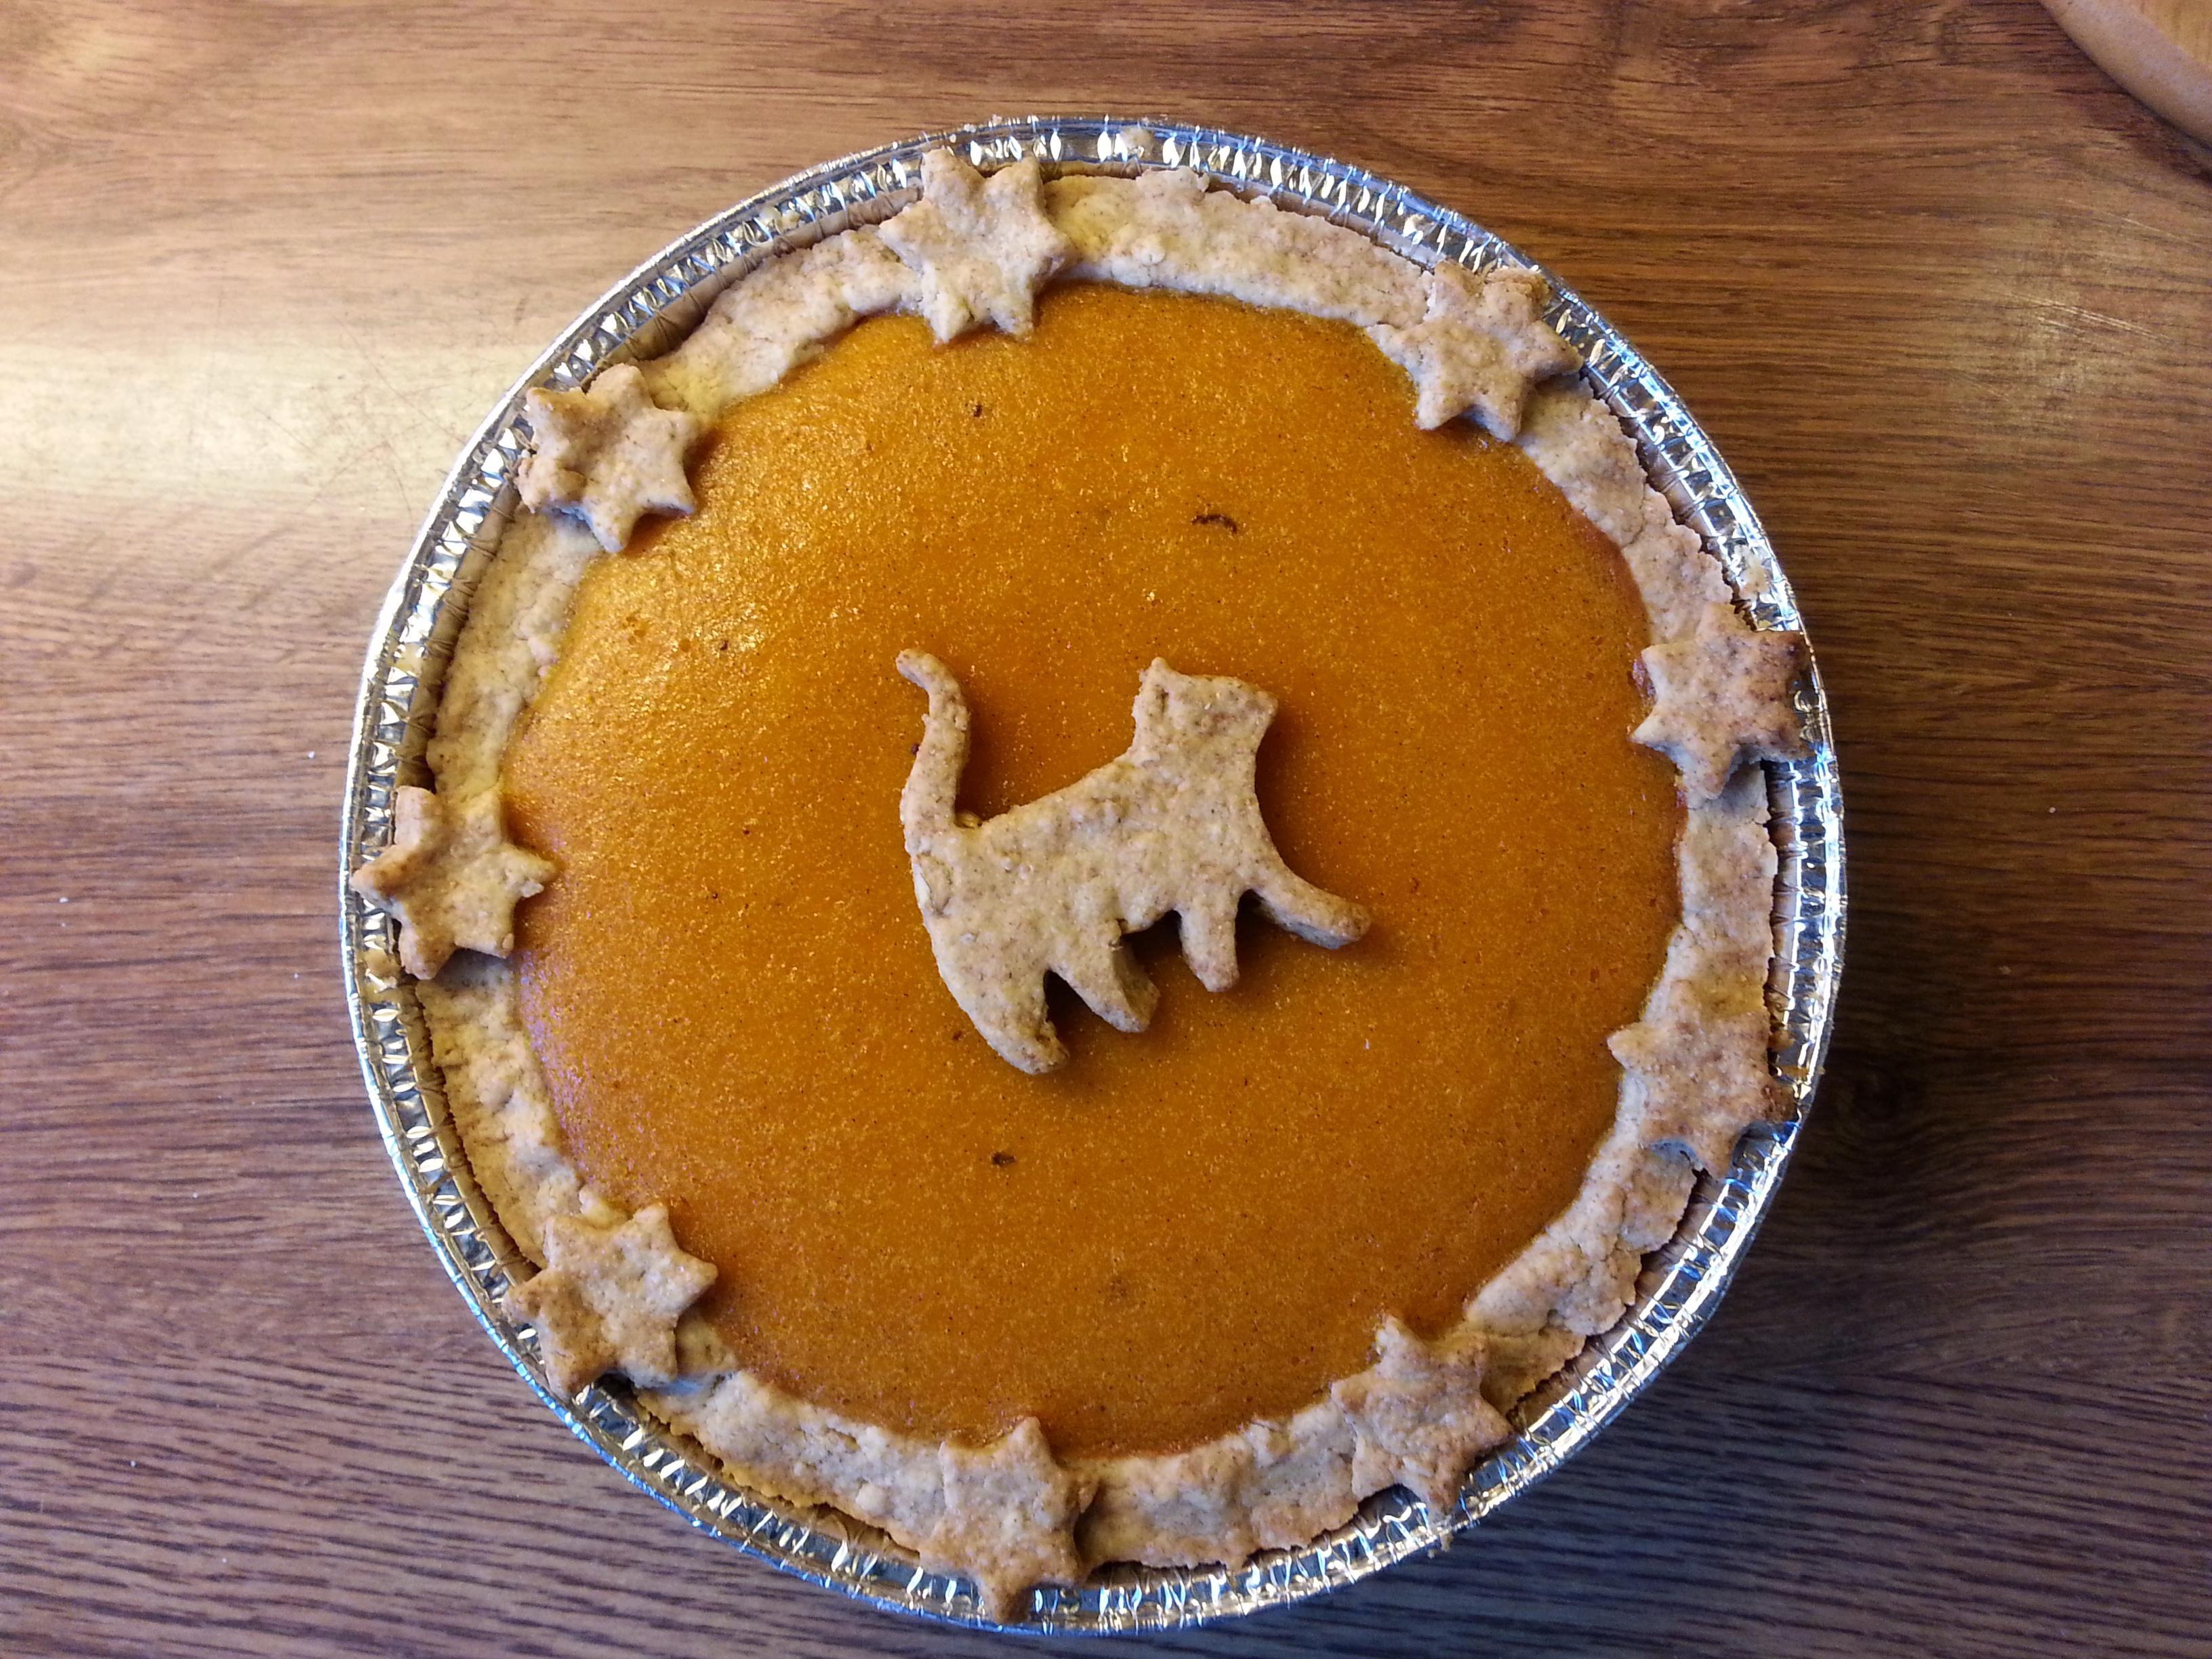 Halloween Pumpkin Pie  [Homemade] Halloween Pumpkin Pie food